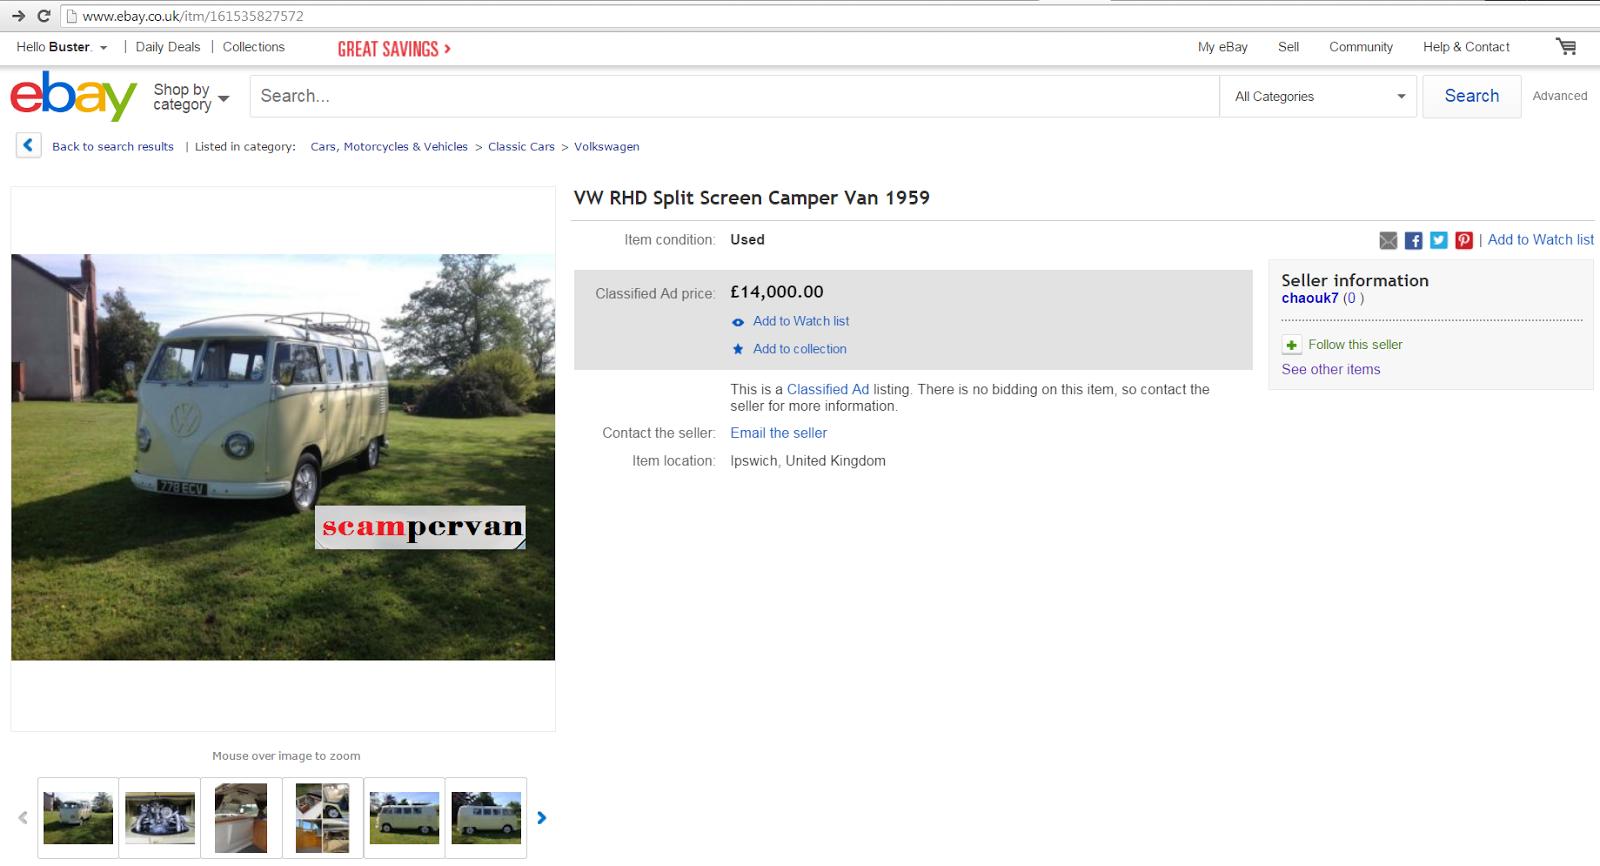 Toyota Dealers Columbus Ohio >> Midwestern Auto Group Home Dealership Columbus Ohio | Upcomingcarshq.com